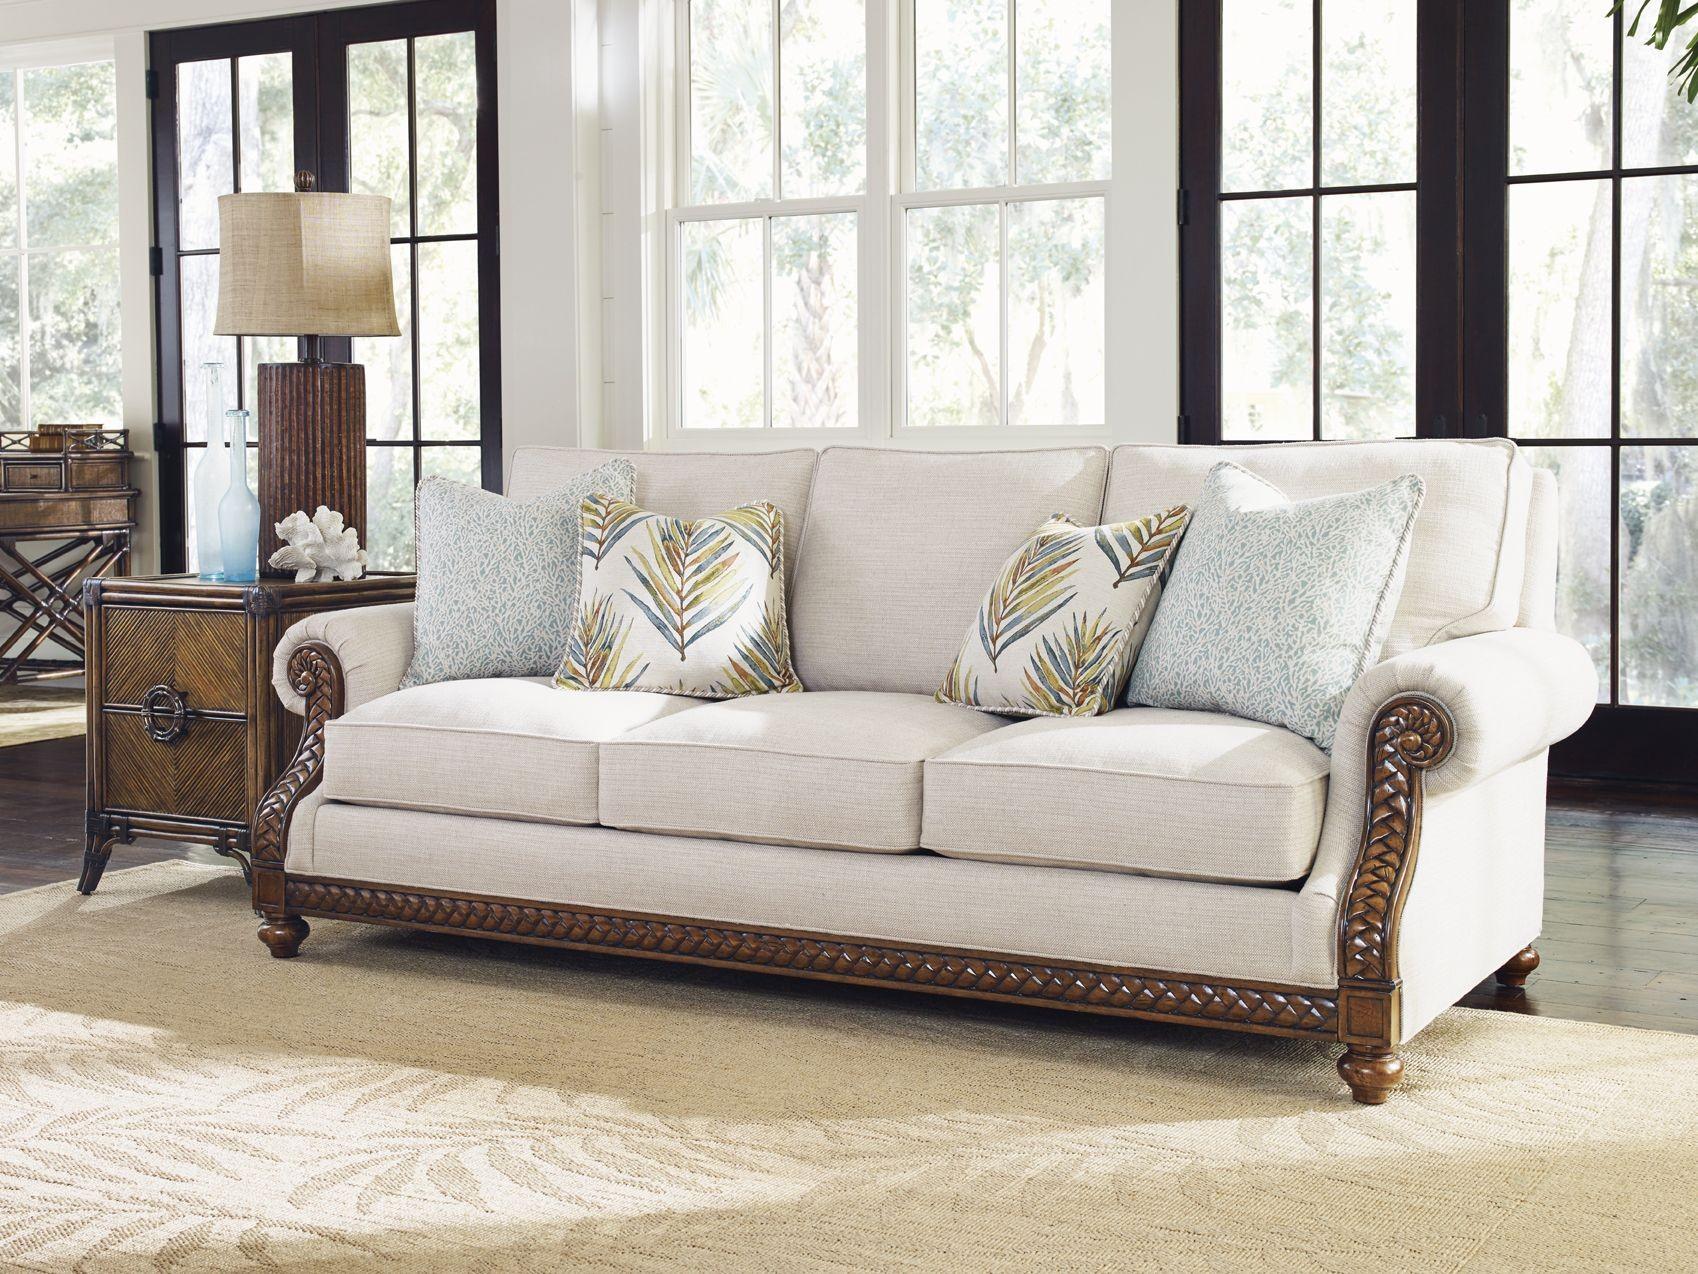 Bali Hai Shoreline Upholstered Living Room Set From Tommy Bahama Coleman Furniture